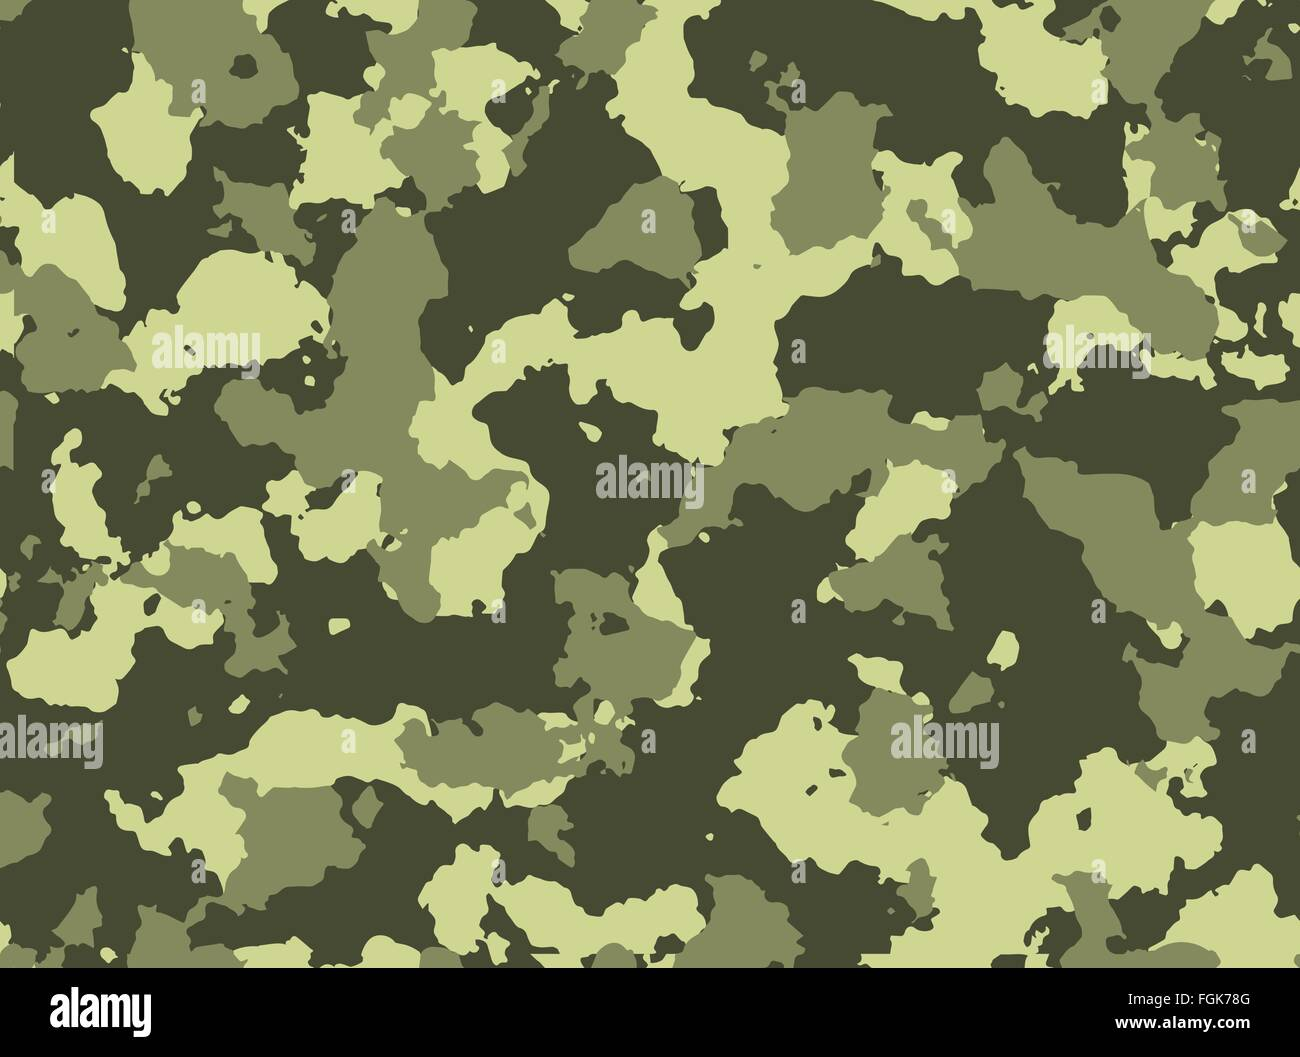 Seamless woodland camo pattern vector eps 10 vector illustration - Stock Image